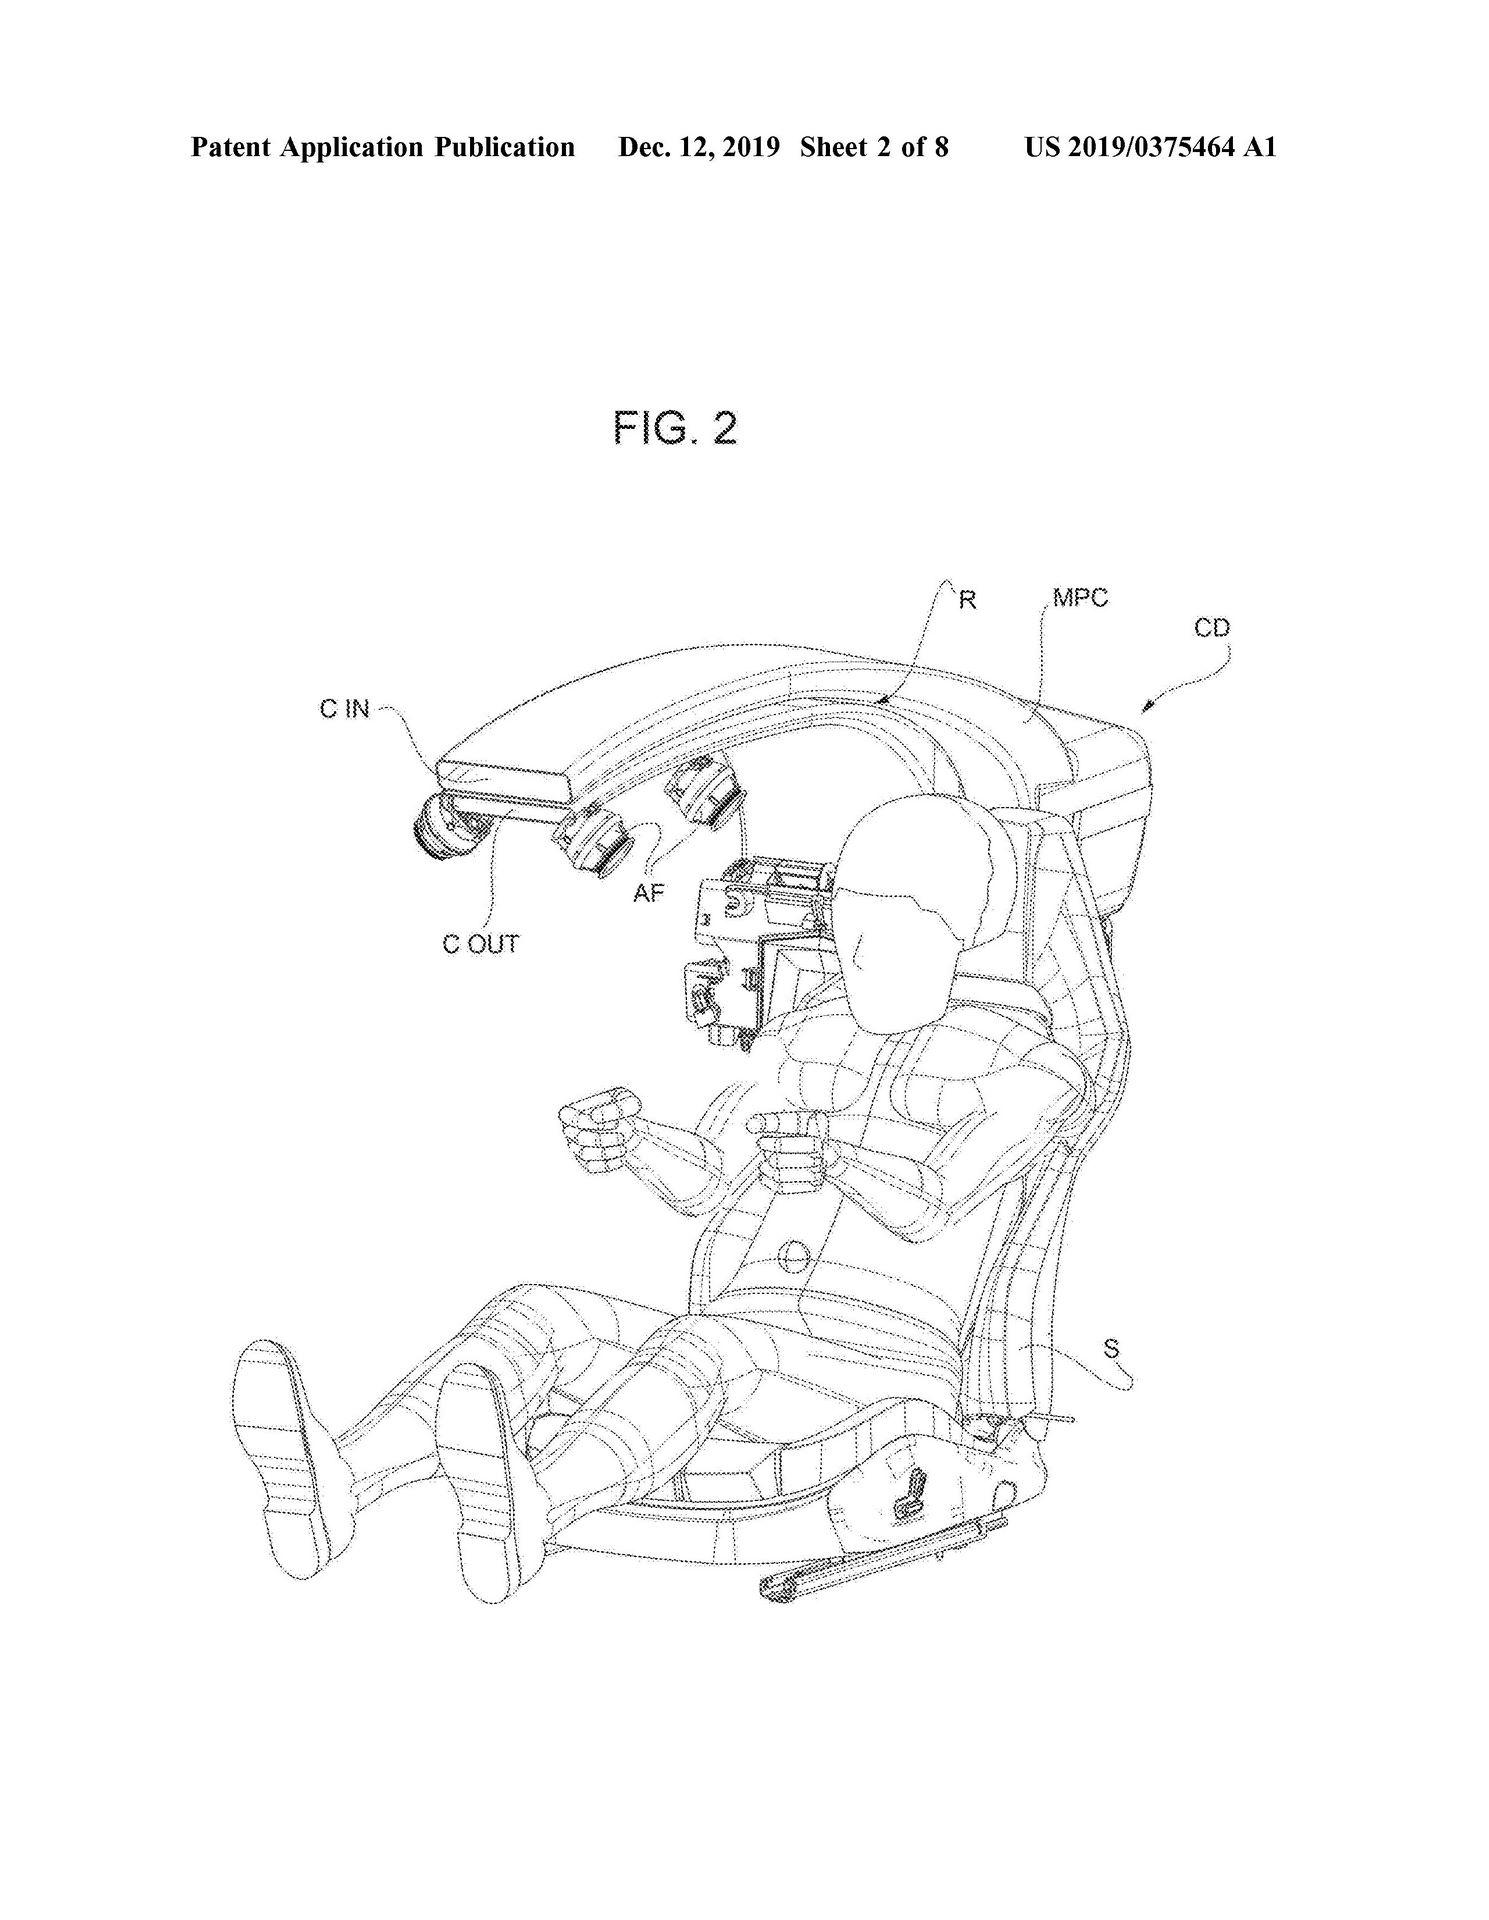 Ferrari-Halo-Cockpit-Pillar-Patent-3